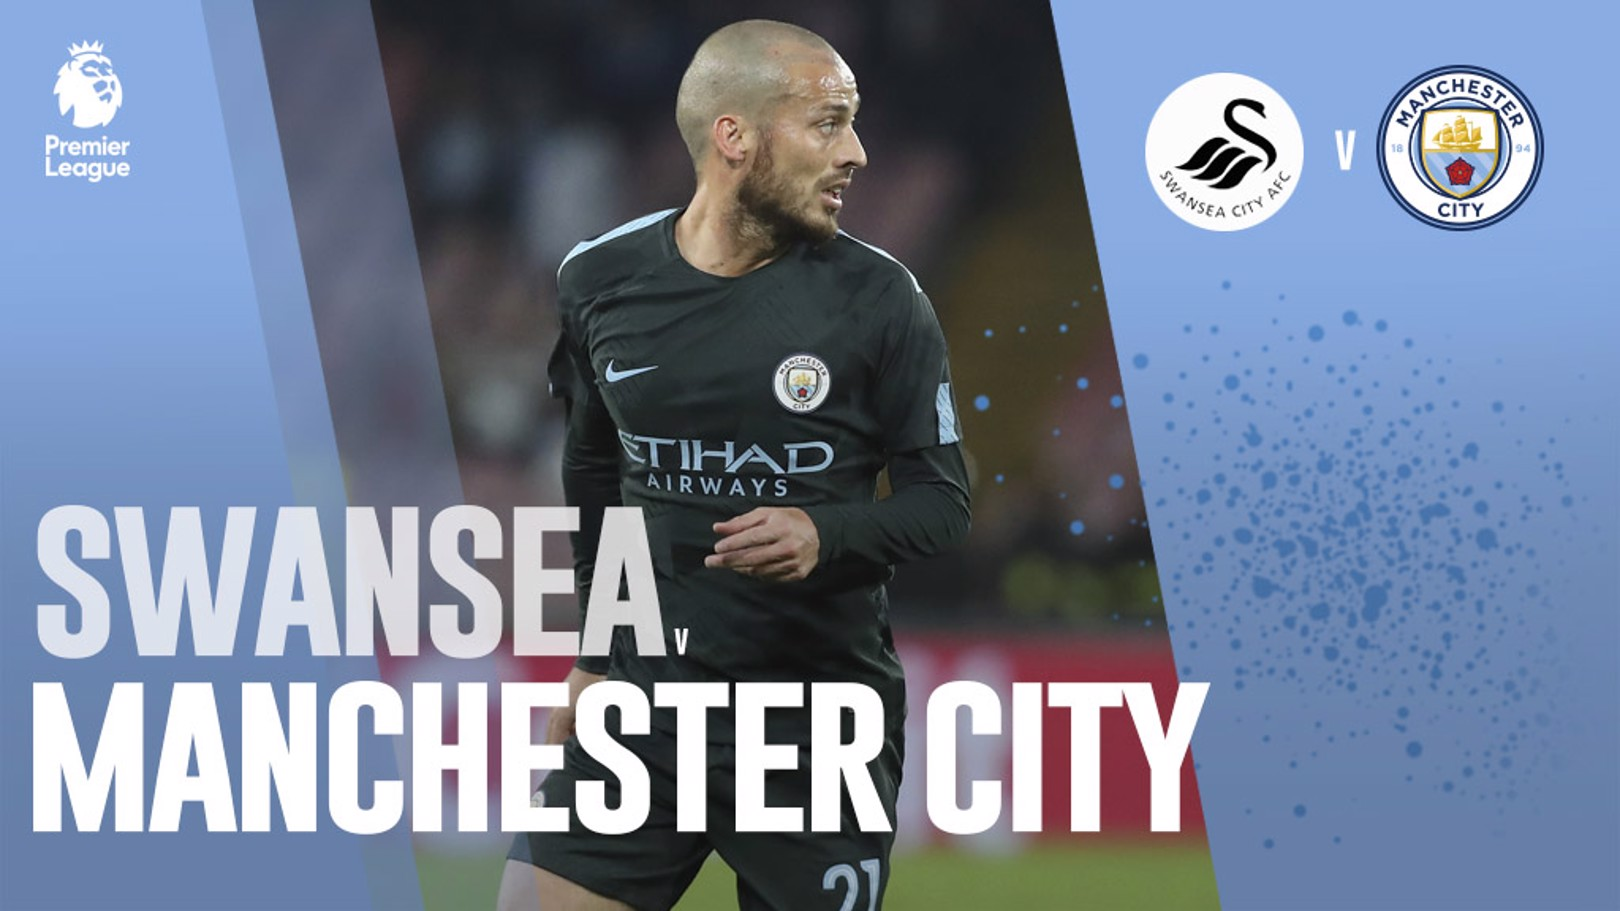 SWANSEA-CITY: Decimoséptima jornada de la Premier League.